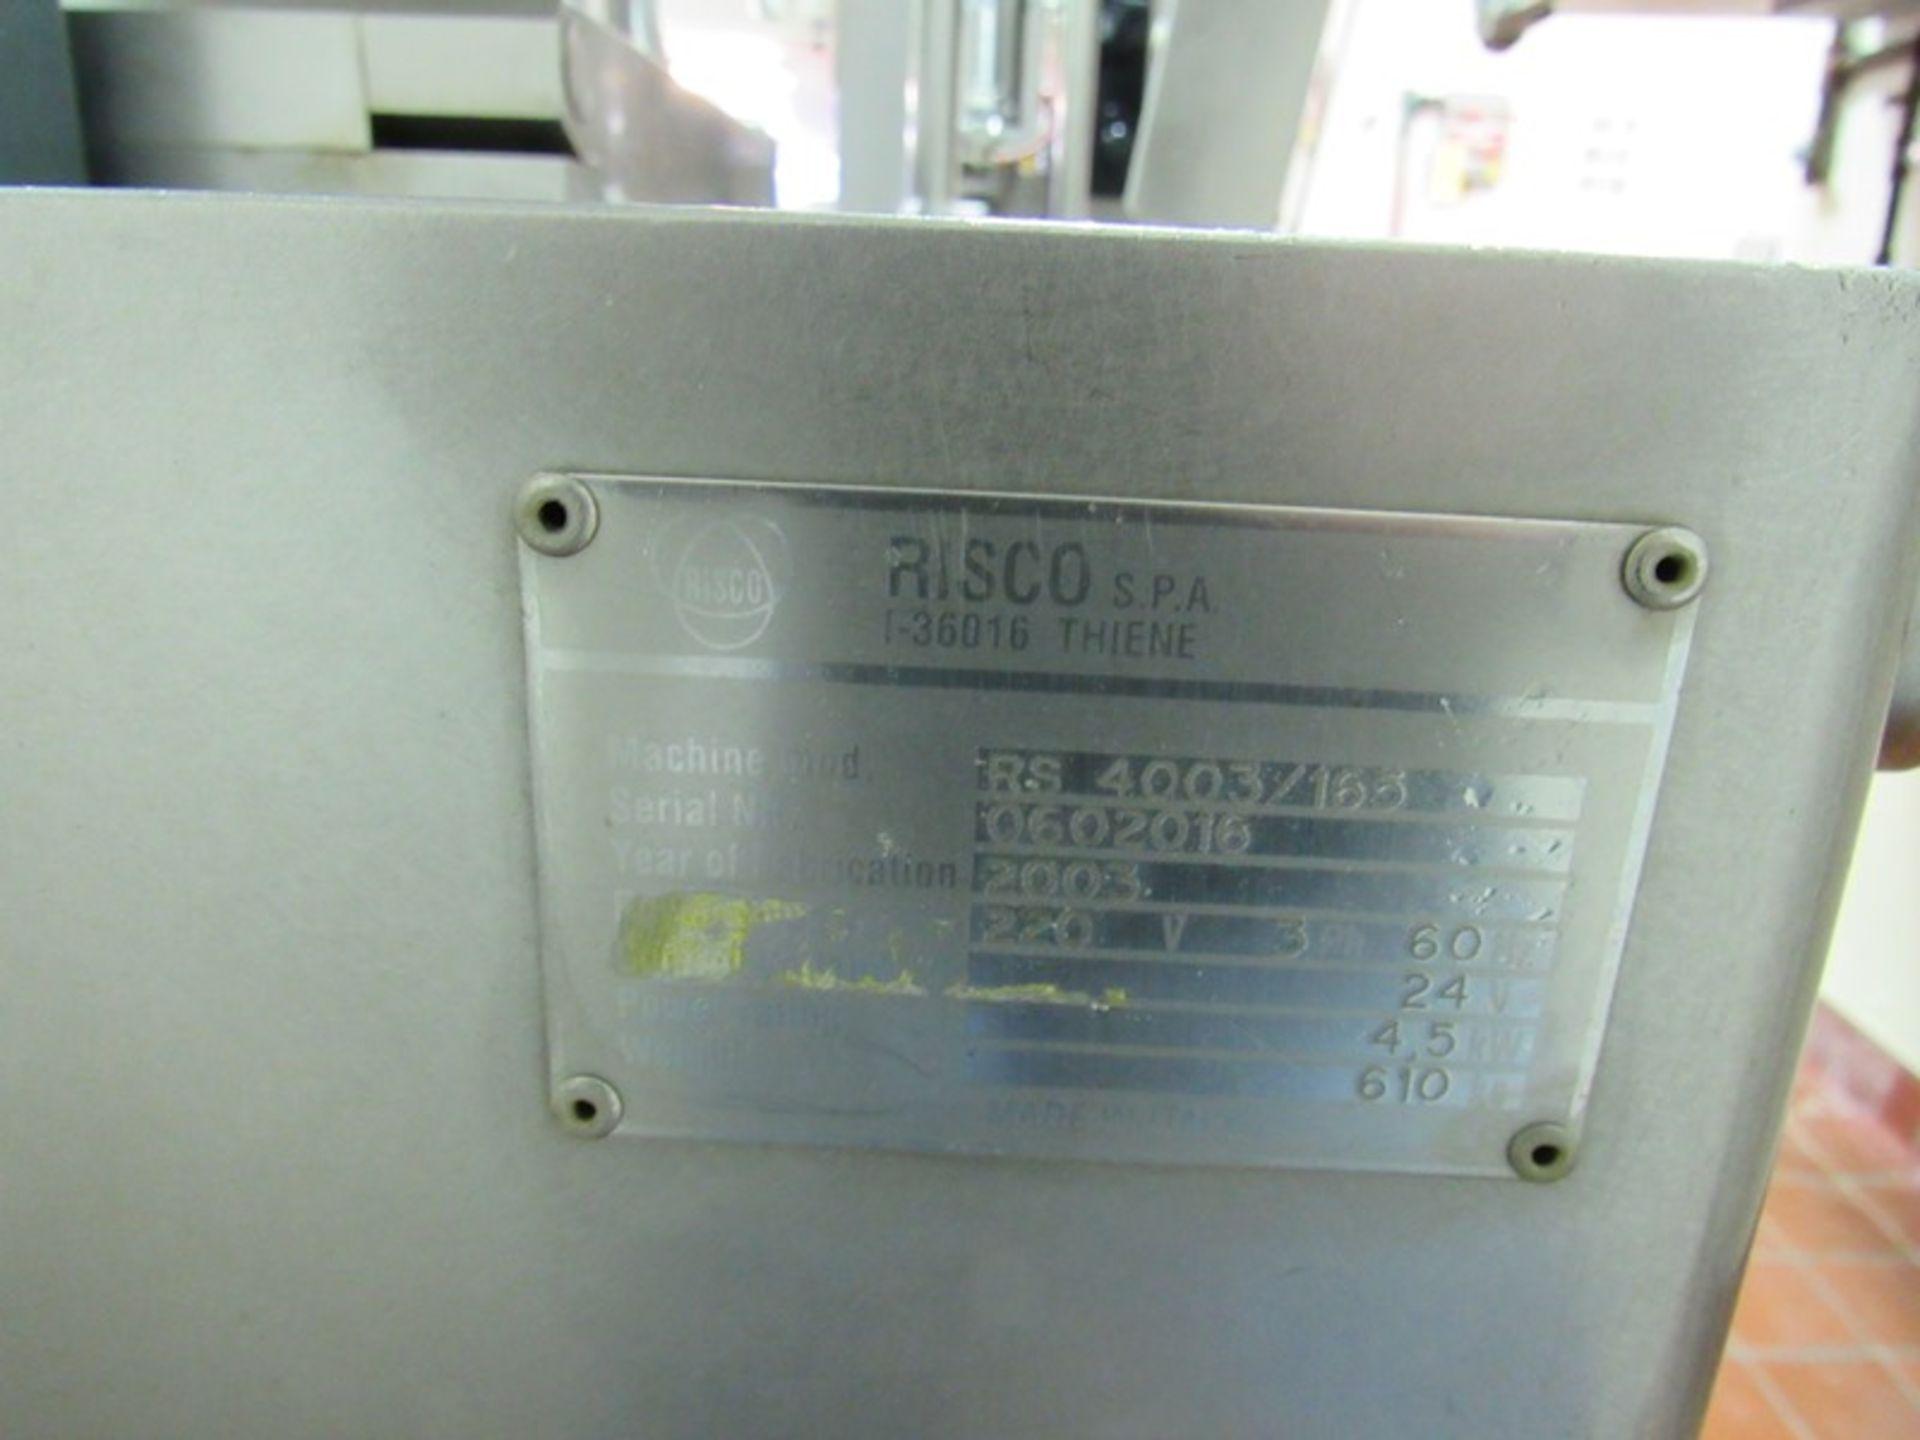 "Lot 32 - Risco Mdl. RS4003/165 Vacuum Stuffer, 32"" dia. X 24"" deep stainless steel hopper, Ser. #0602016, 220"